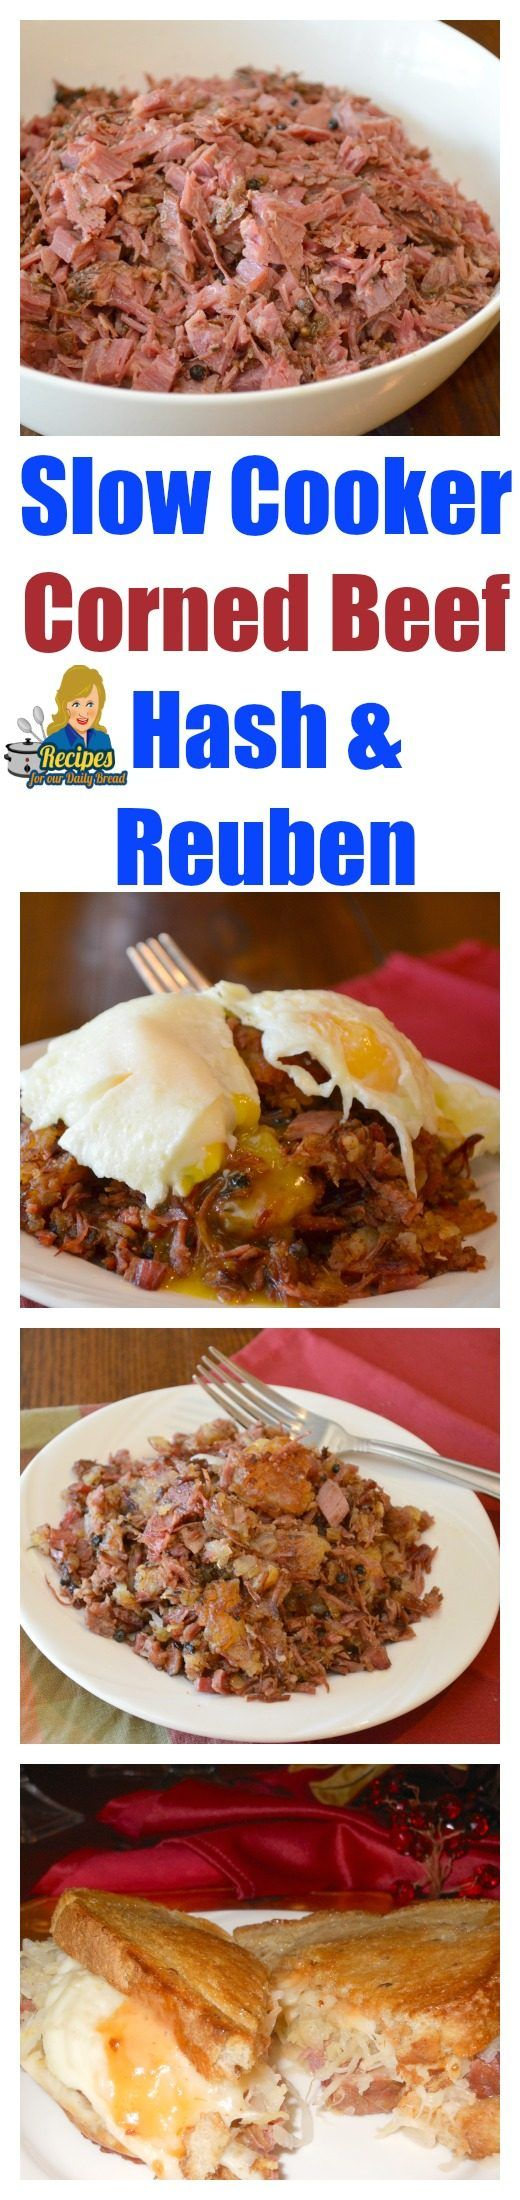 Crockpot corned beef Hash & Reuben Sandwiches perfect for St. Patricks Days perfect for St. Patricks Days  SEE FULL RECIPE HERE: https://recipesforourdailybread.com/best-crock-pot-corned-beef-sandwiches-hash/